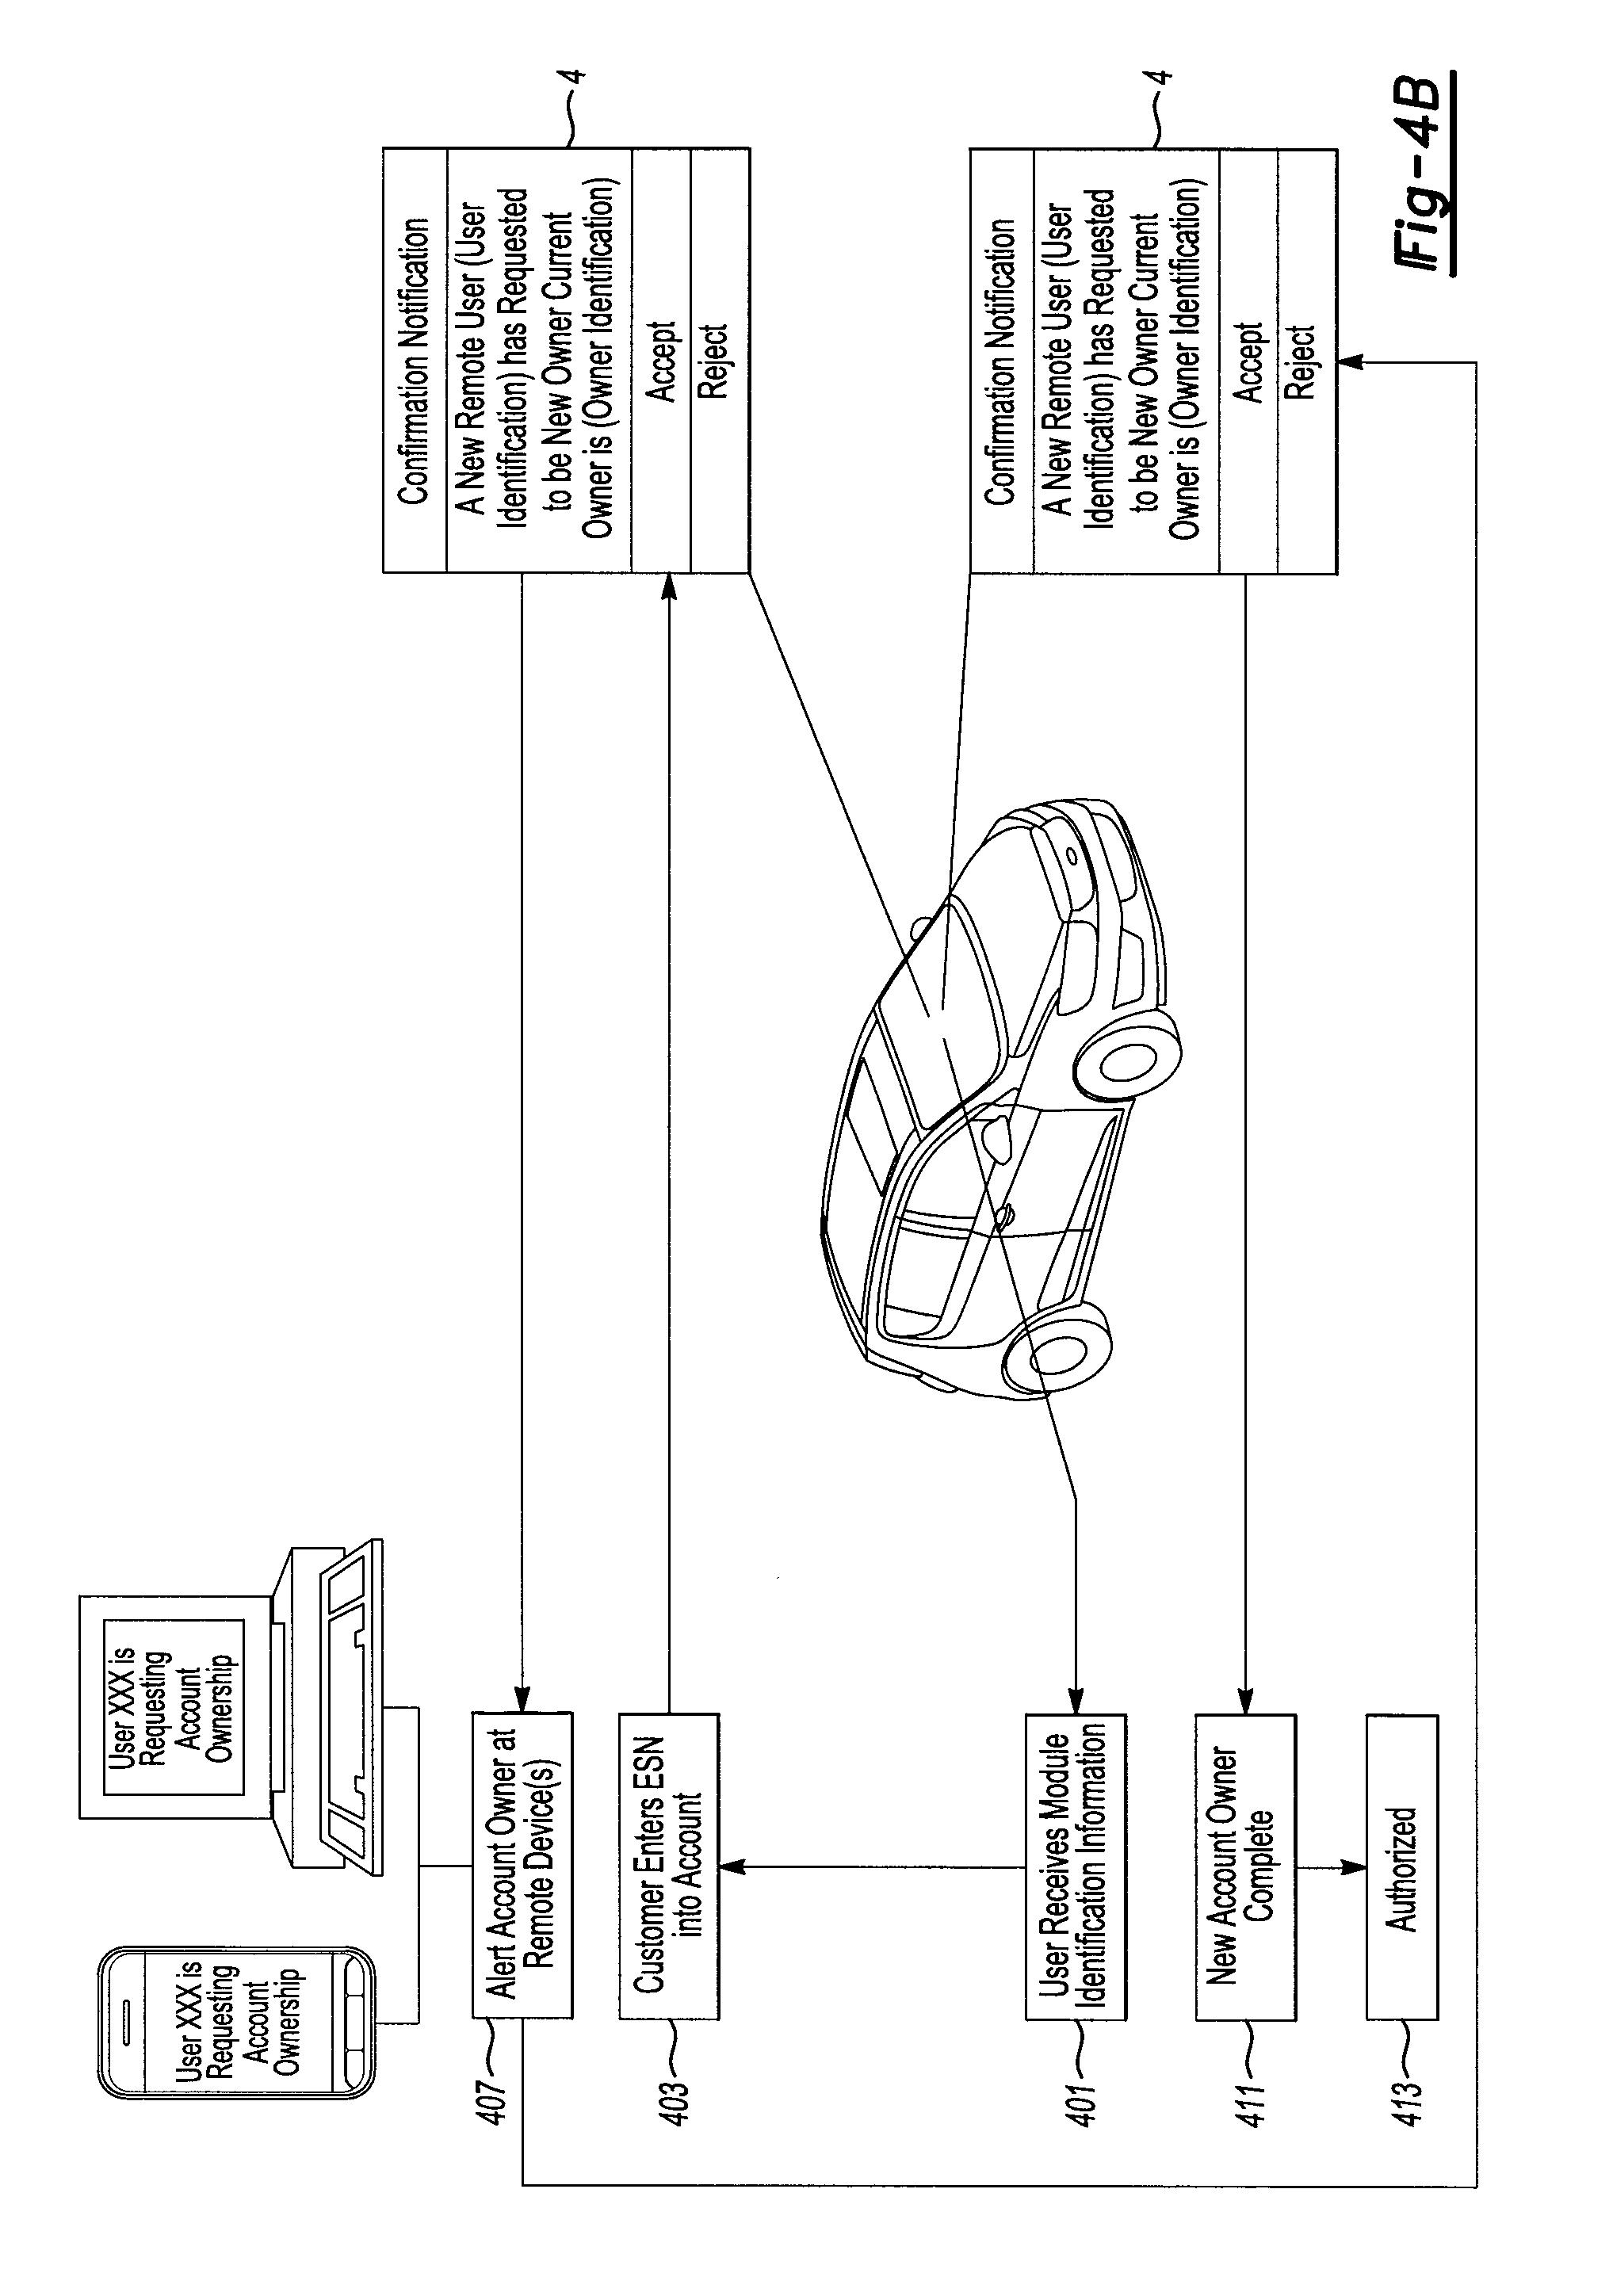 Patent US 9,064,101 B2